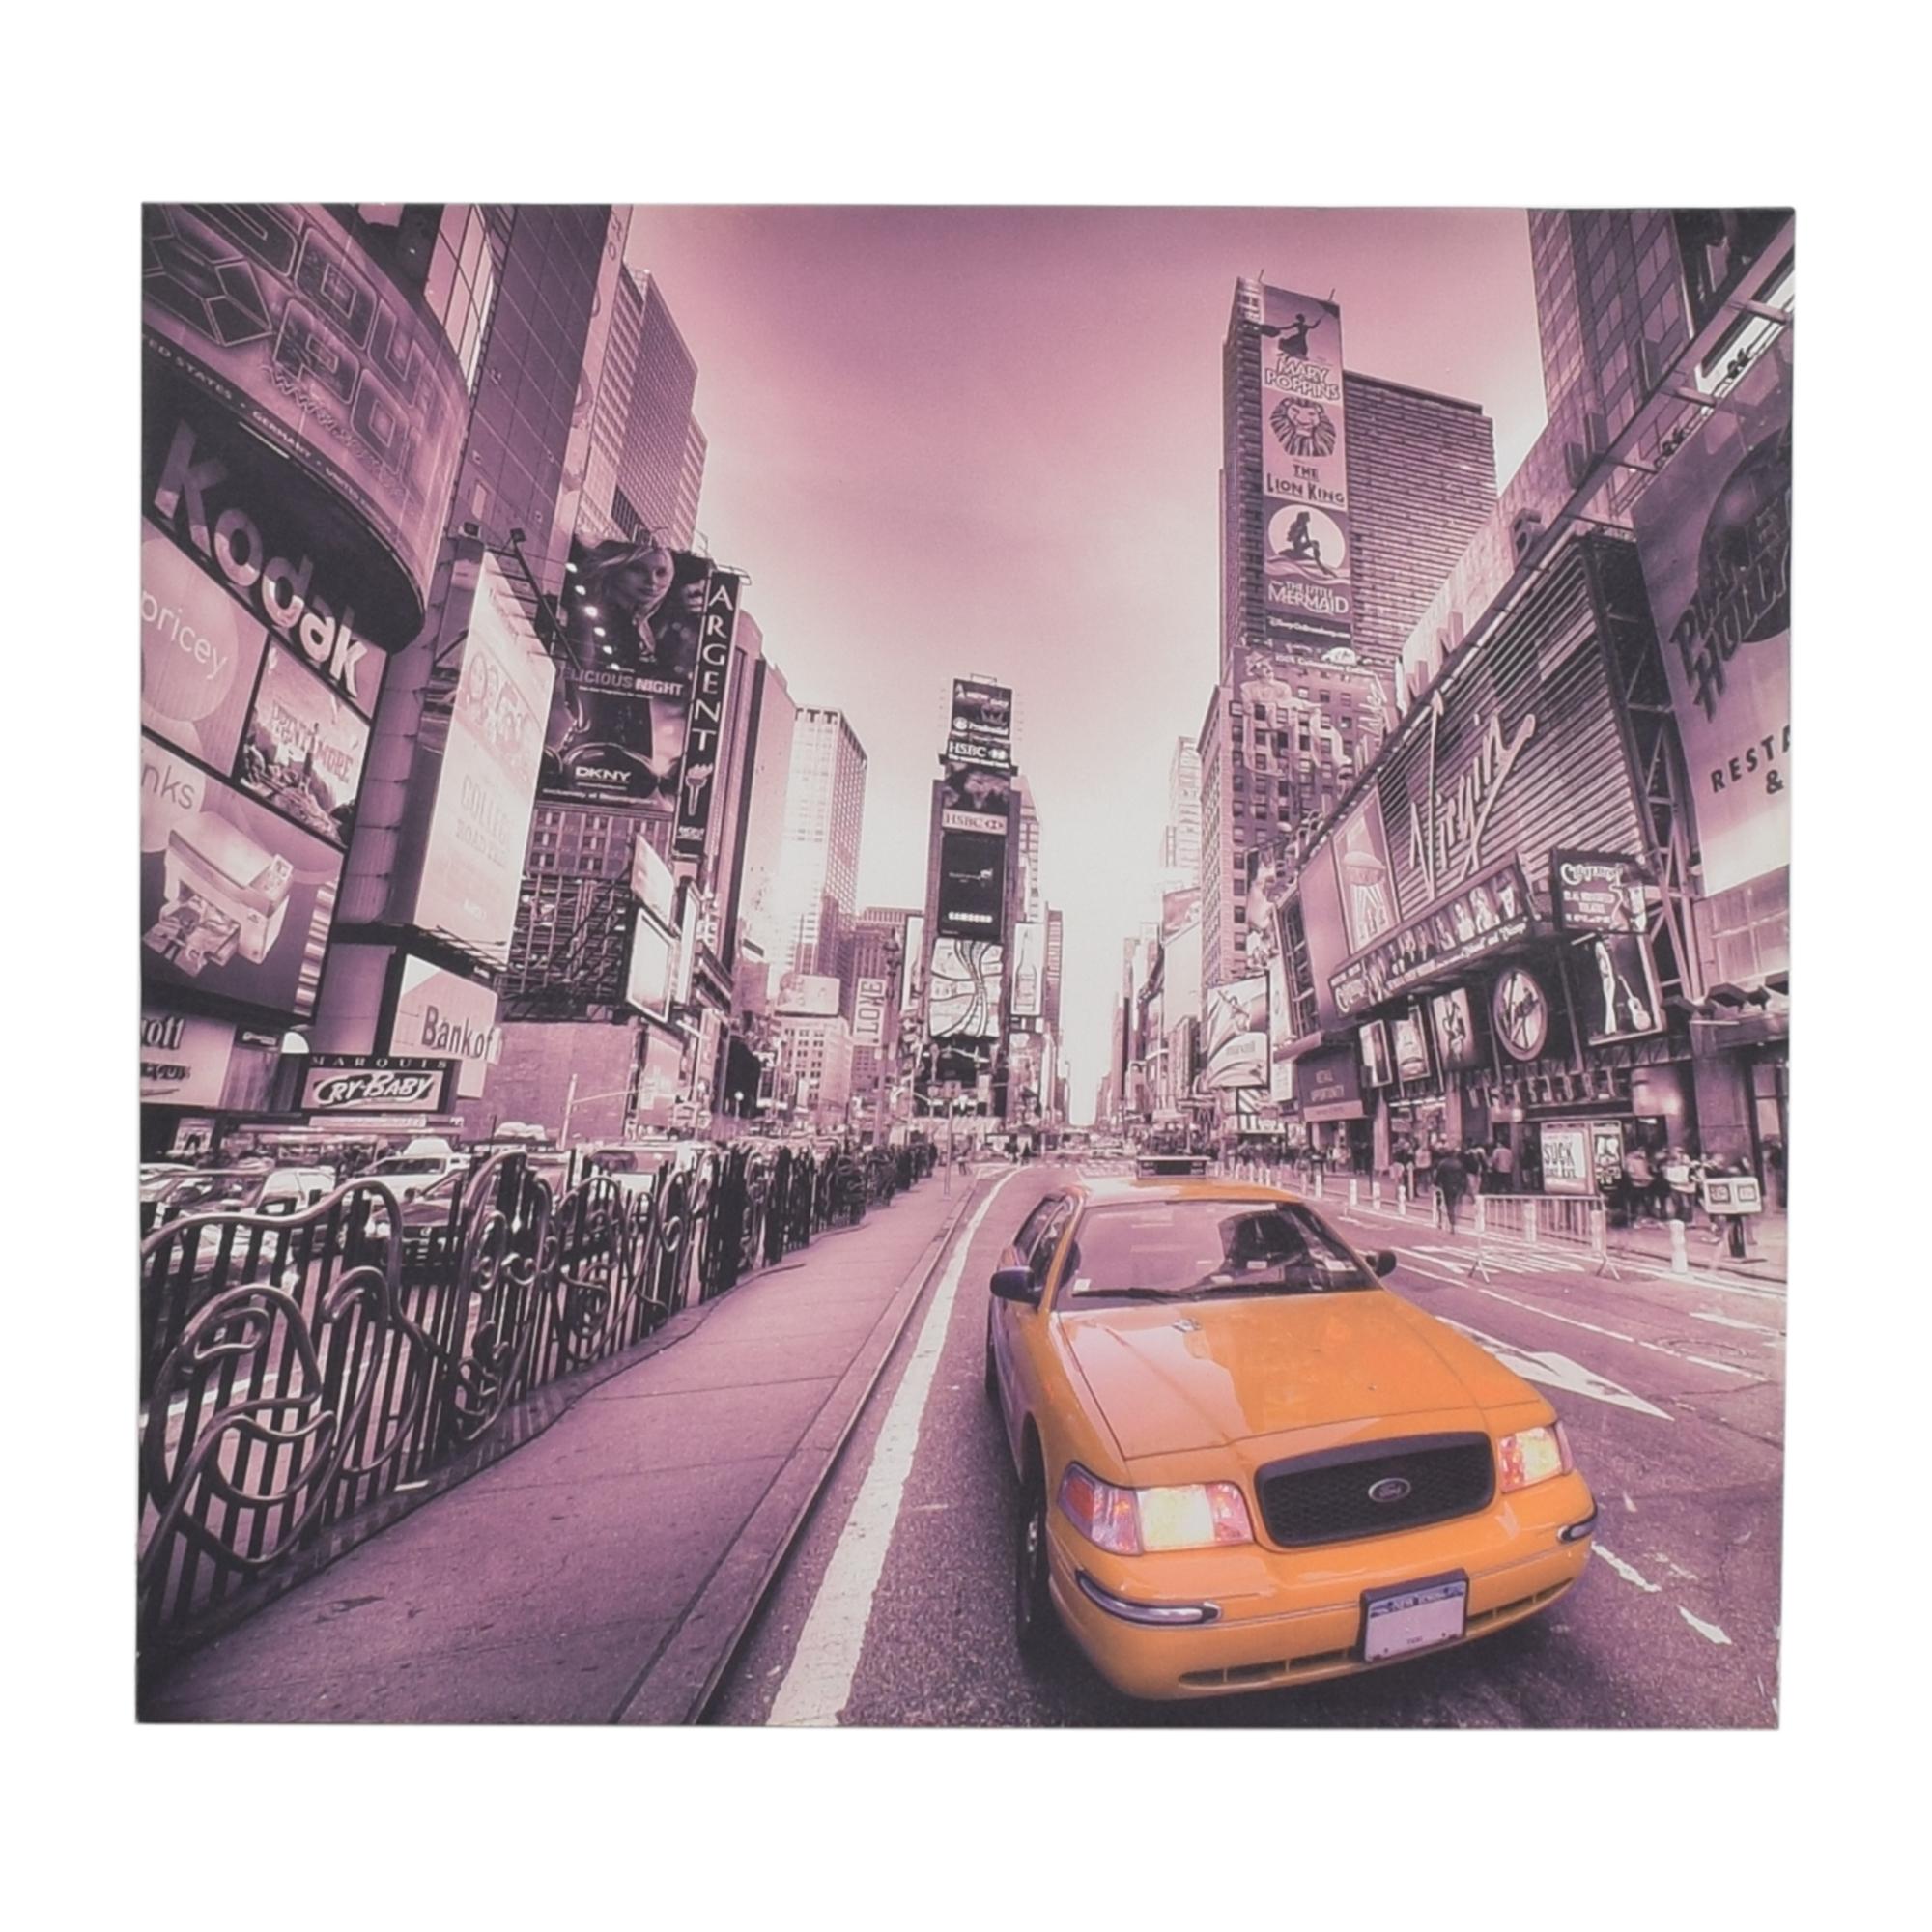 New York Taxi Wall Art multi